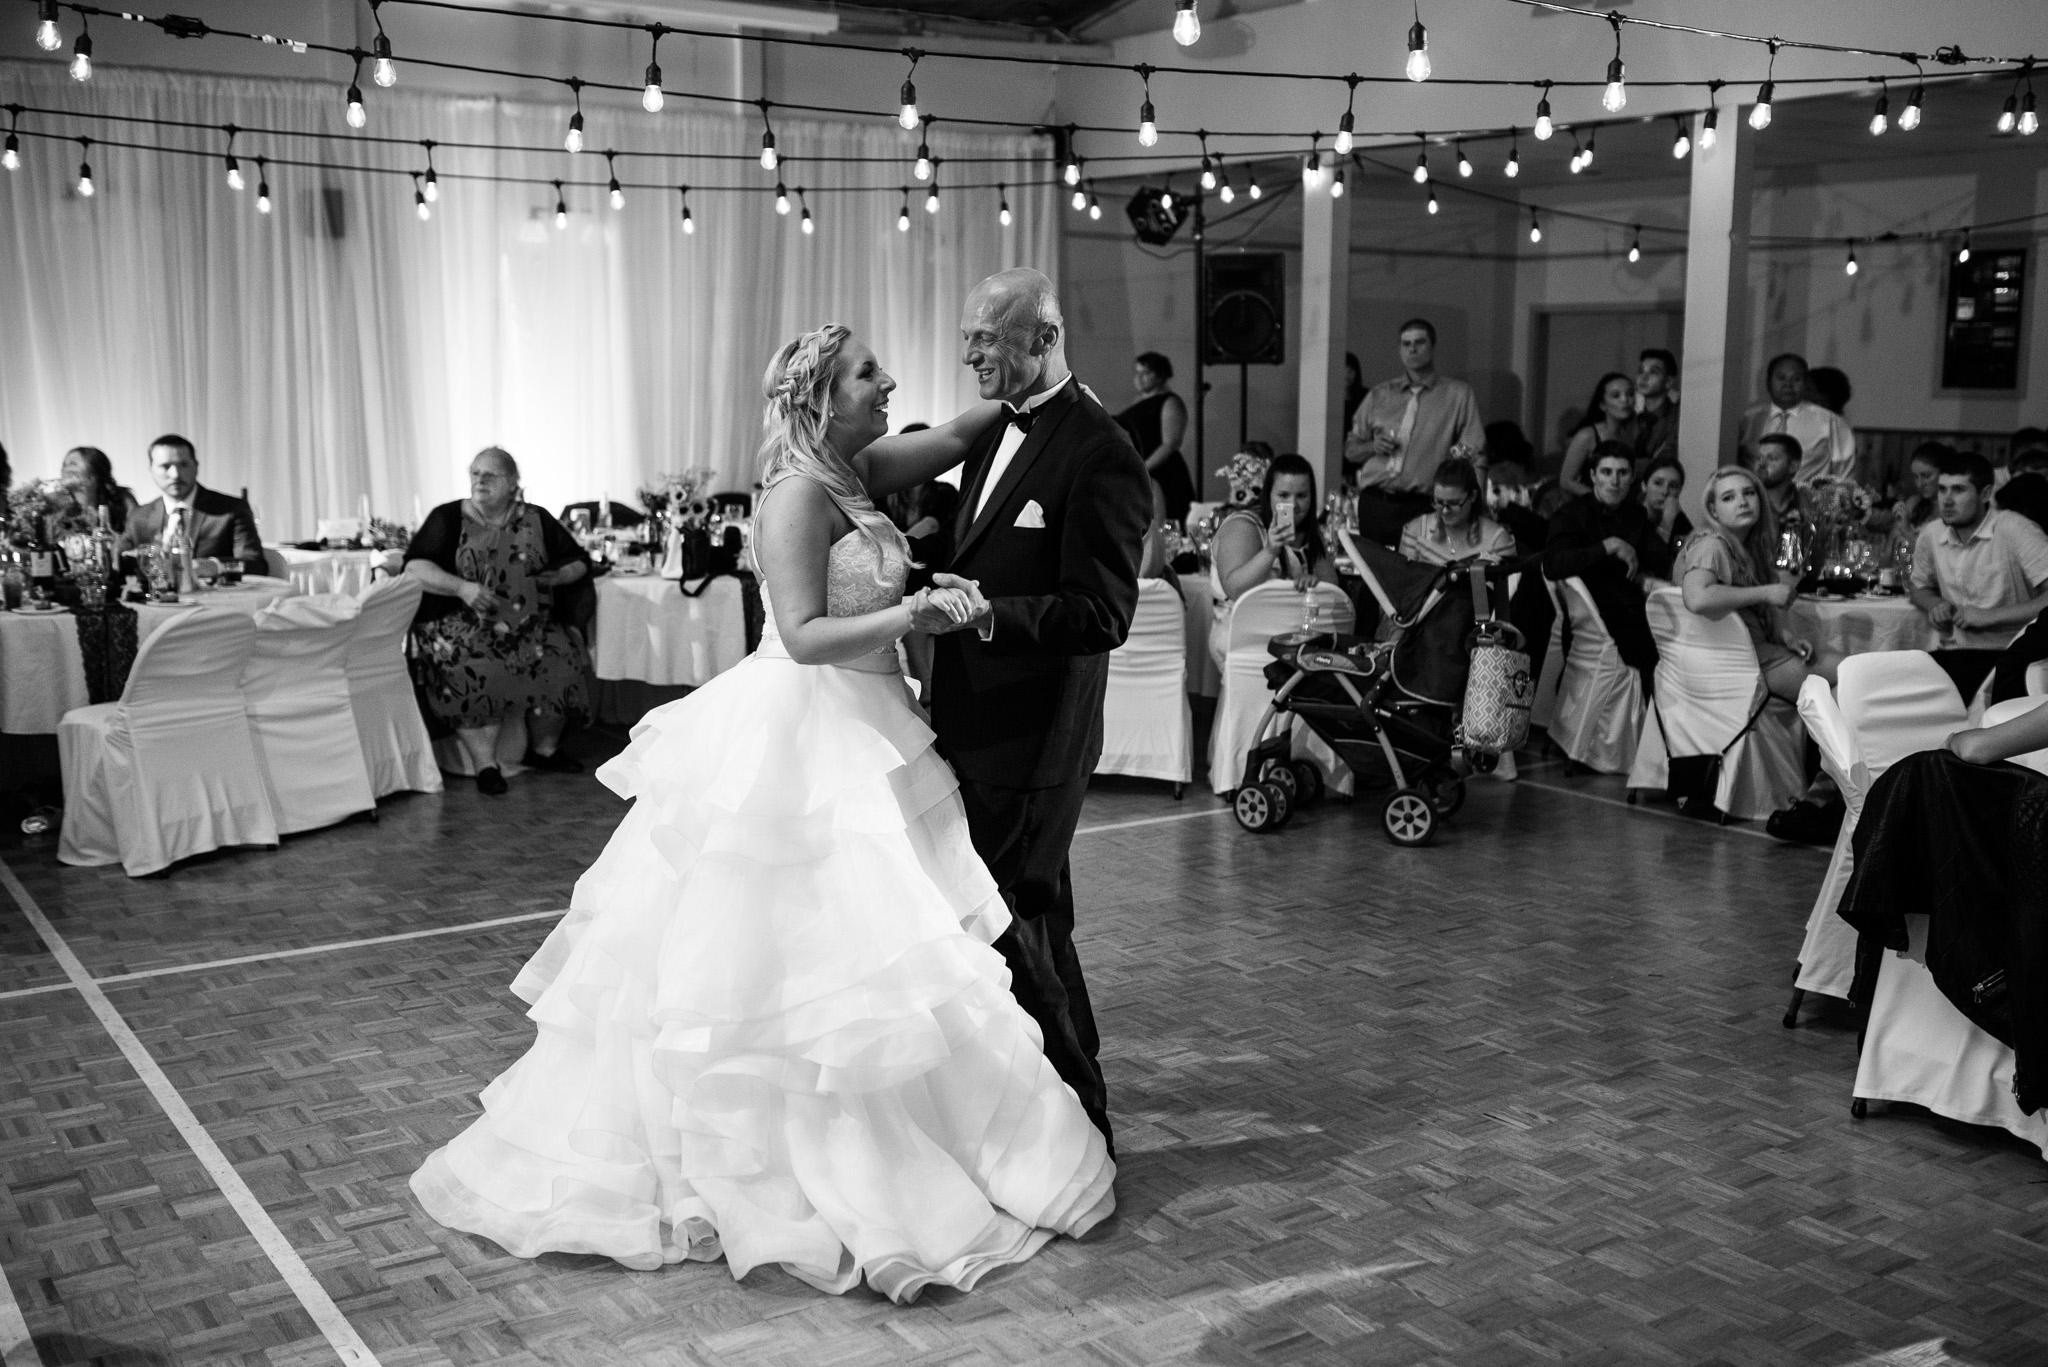 victoria-wedding-photographers-prospect-community-hall-wedding-64.jpg